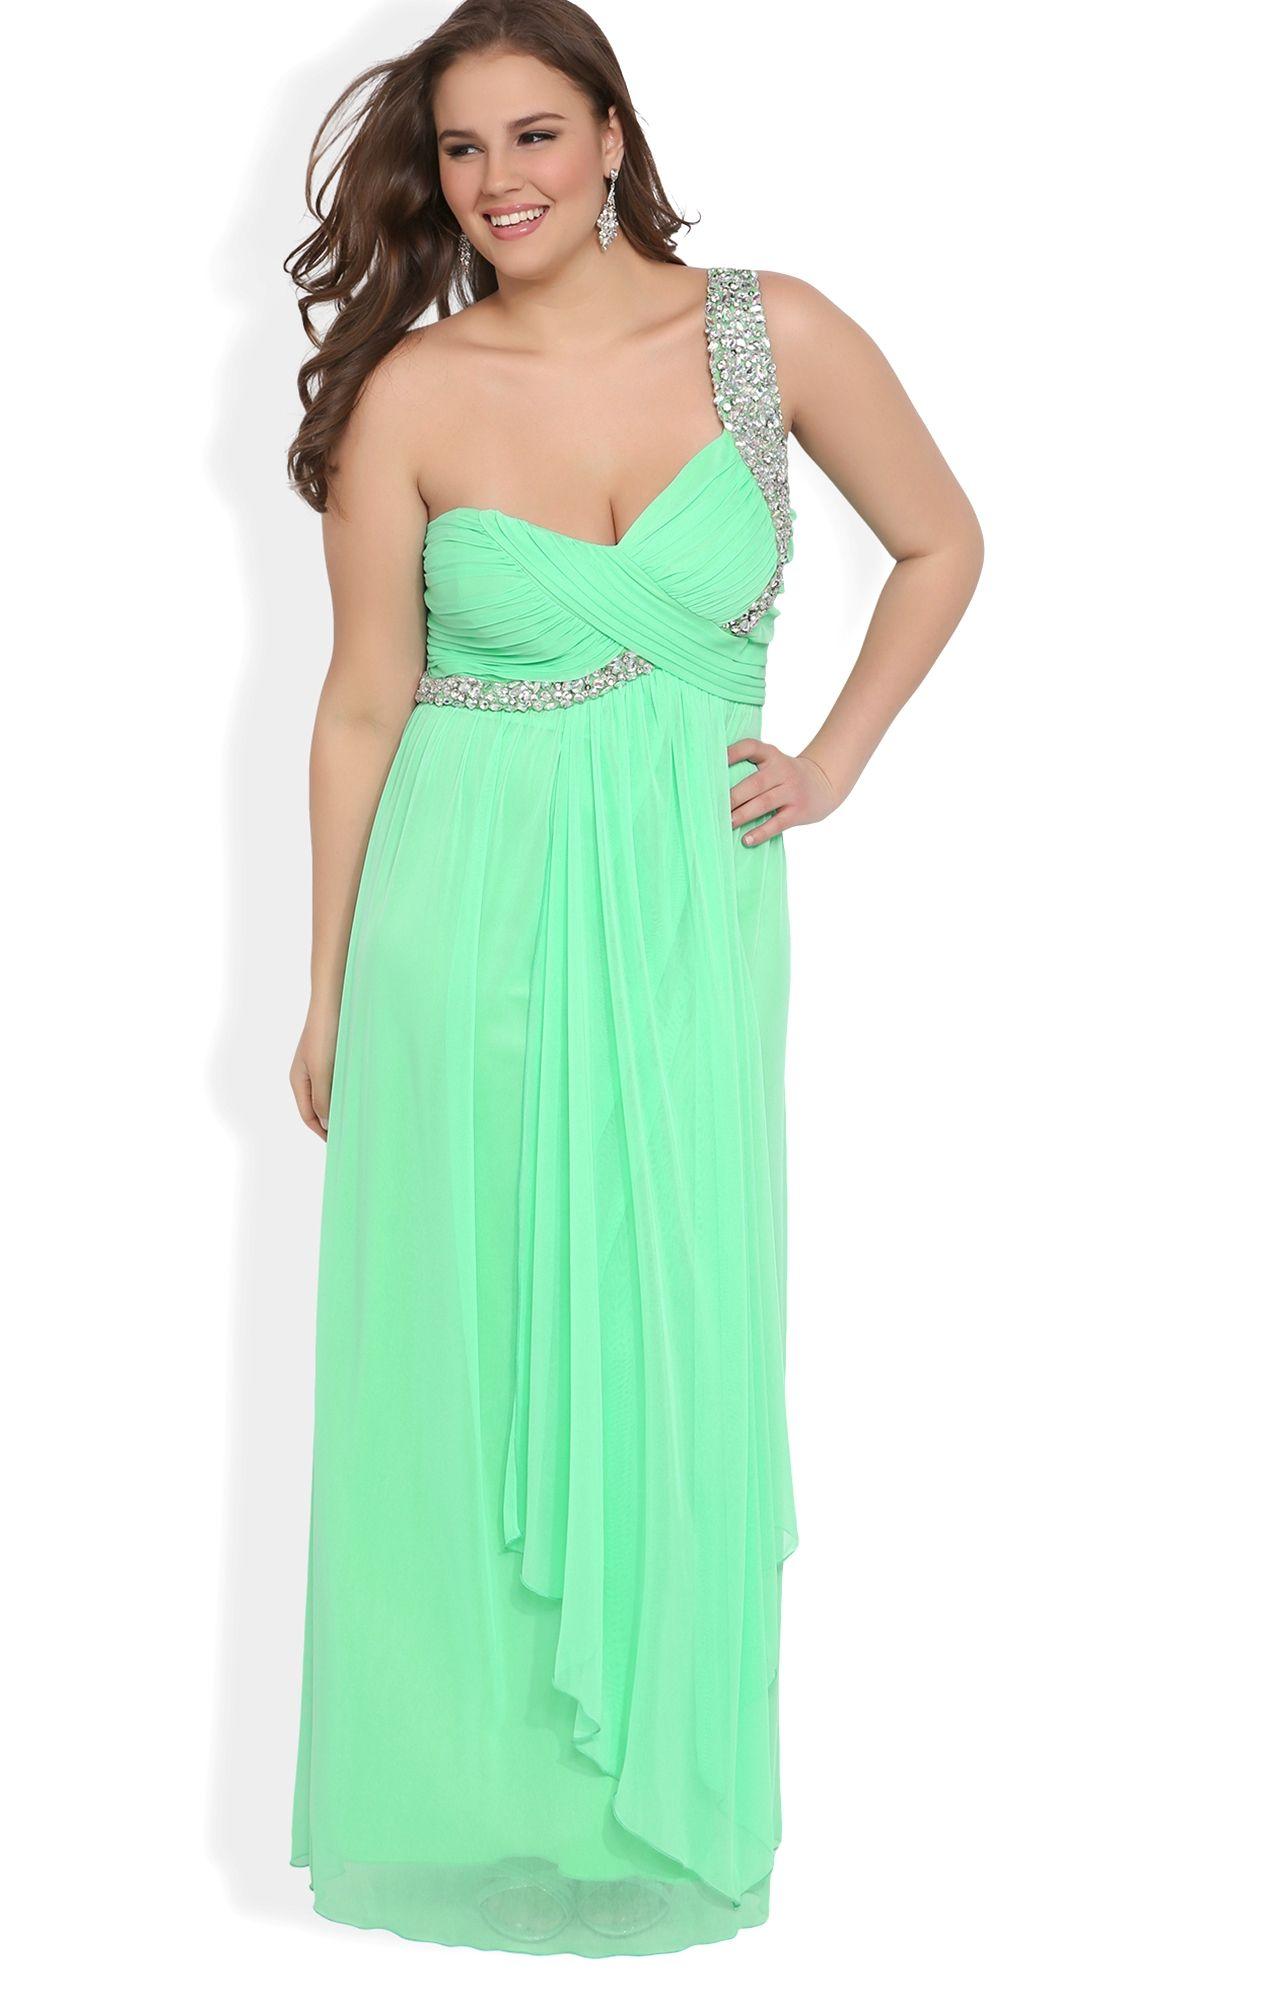 1000056594 340 Alt1 1266x2000 Jpg 1266 2000 Plus Size Prom Dresses Dresses Prom Dresses [ 2000 x 1266 Pixel ]